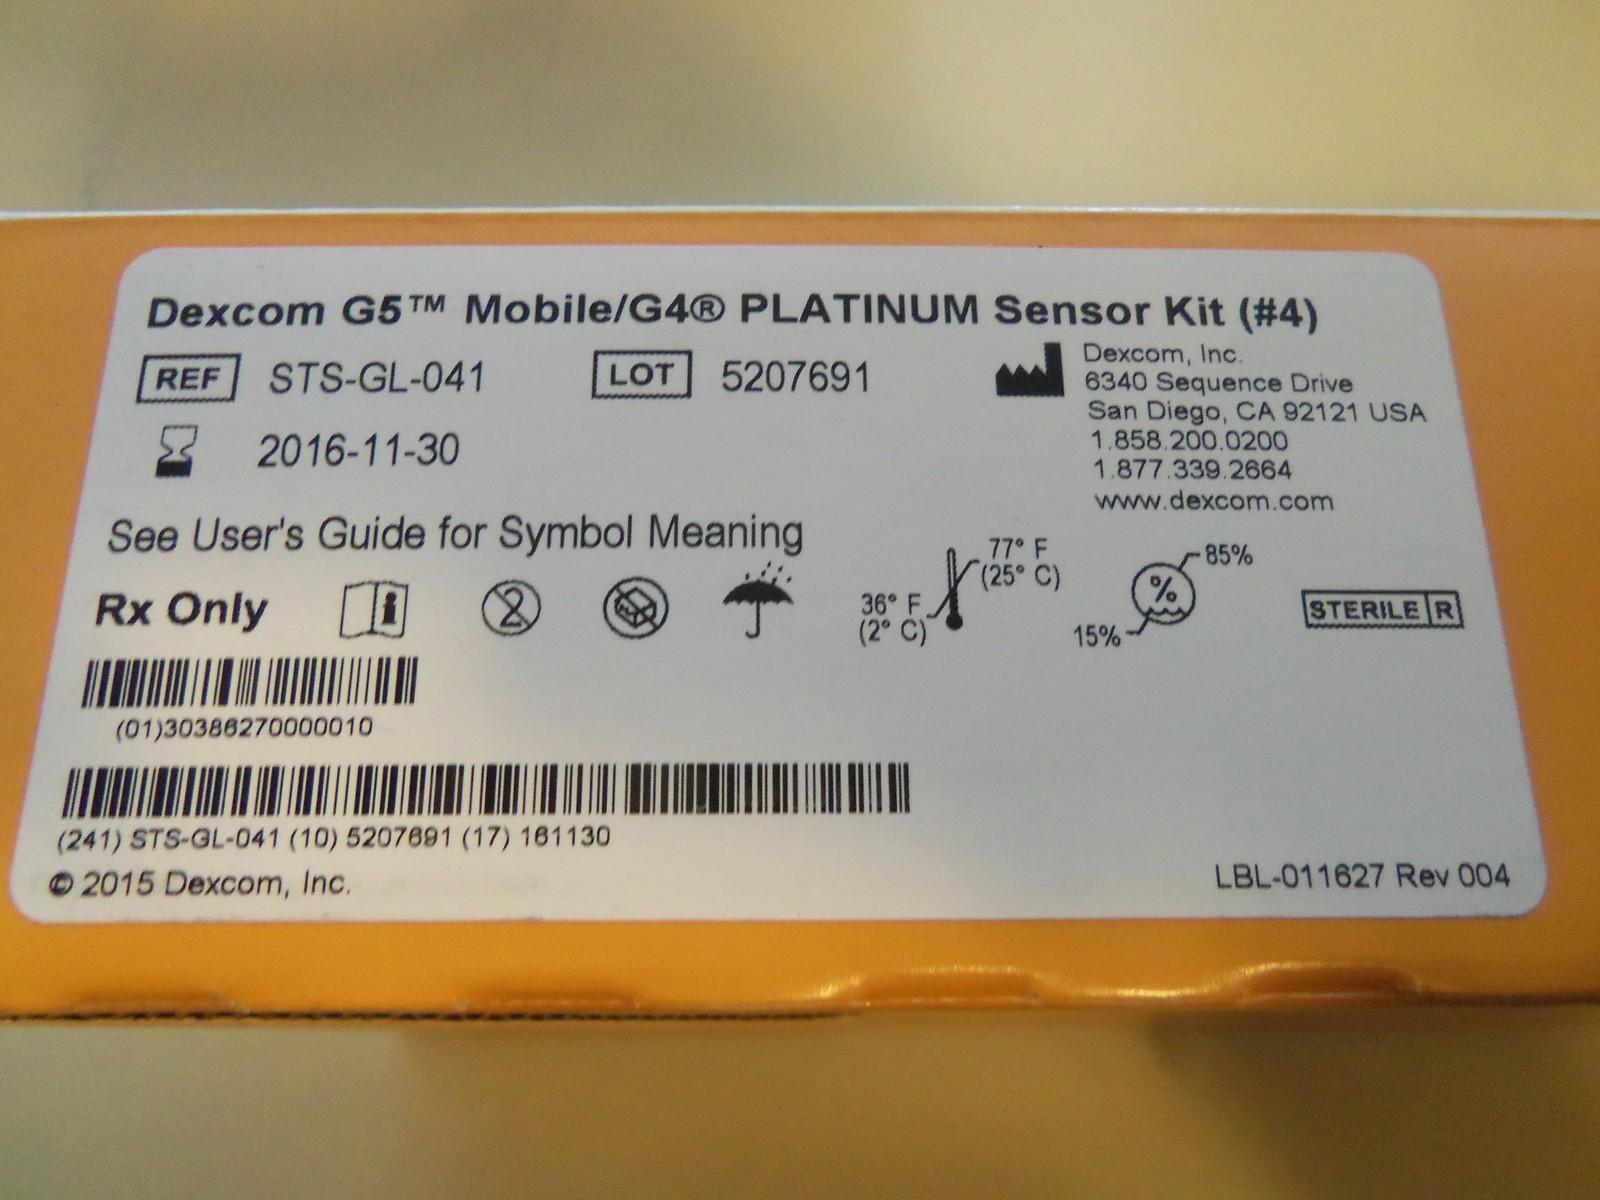 Dexcom G5 Mobile G4 Platinum Sensor Kit And 46 Similar Items